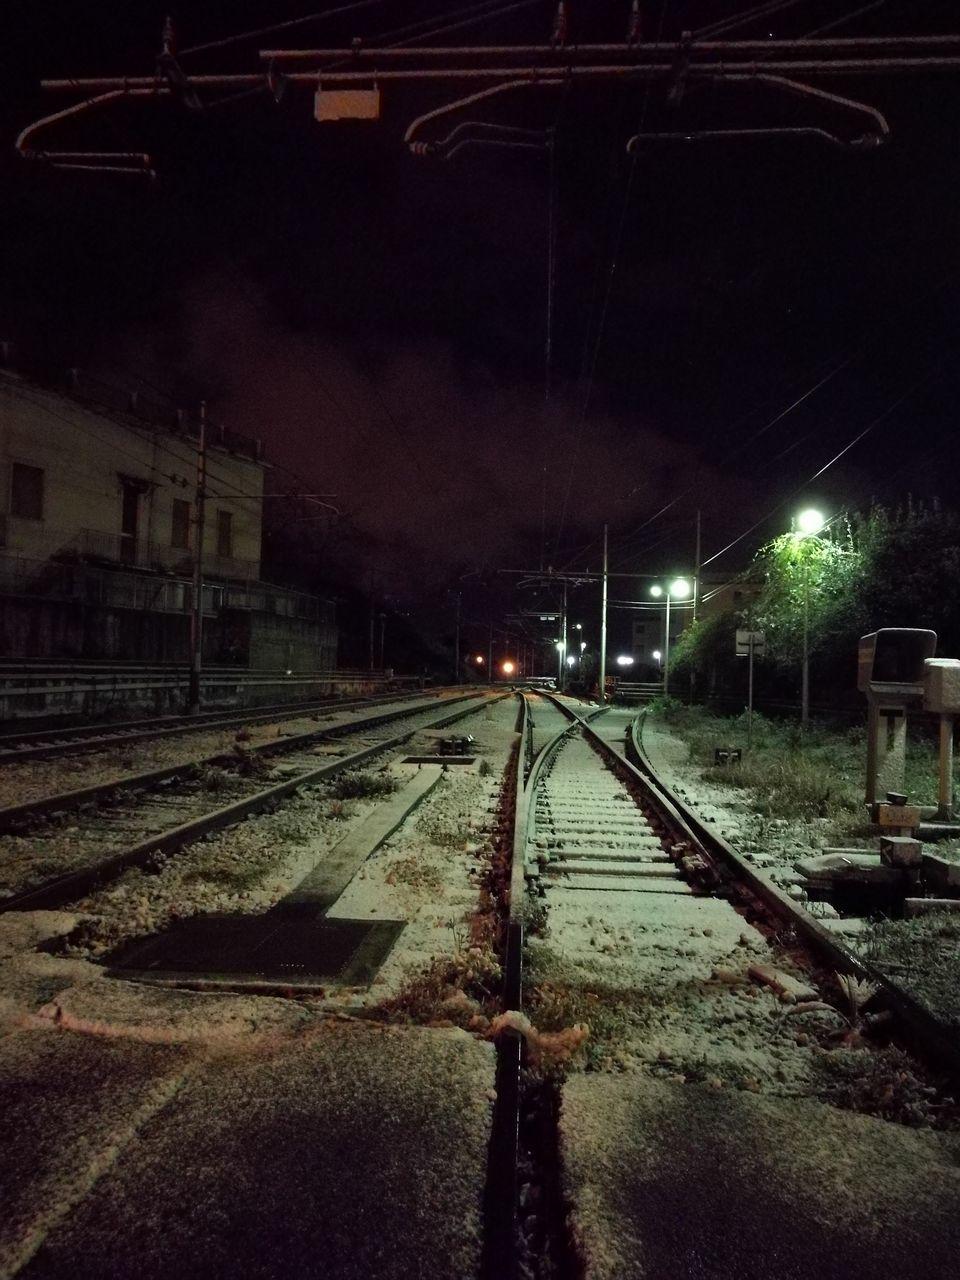 railroad track, night, transportation, rail transportation, illuminated, no people, train - vehicle, public transportation, outdoors, sky